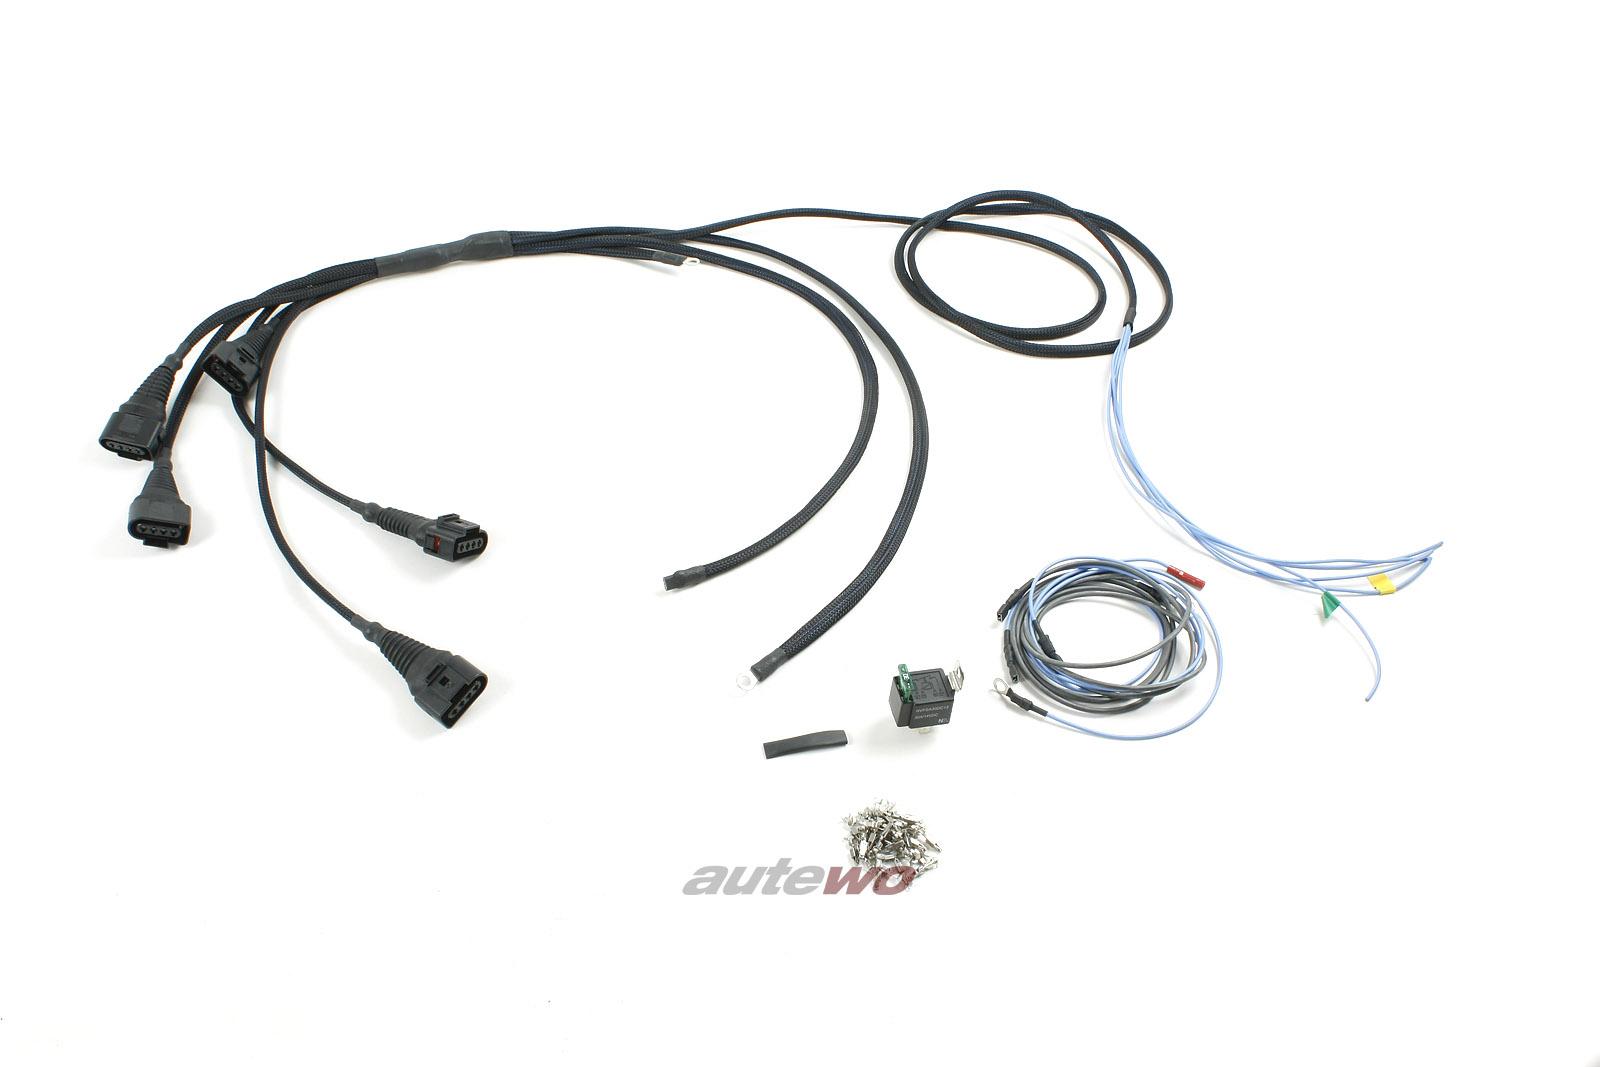 NEU Audi 200 20V Turbo/S2 Coupe 89/Urquattro RR/3B Kabelsatz Stabzündspulen